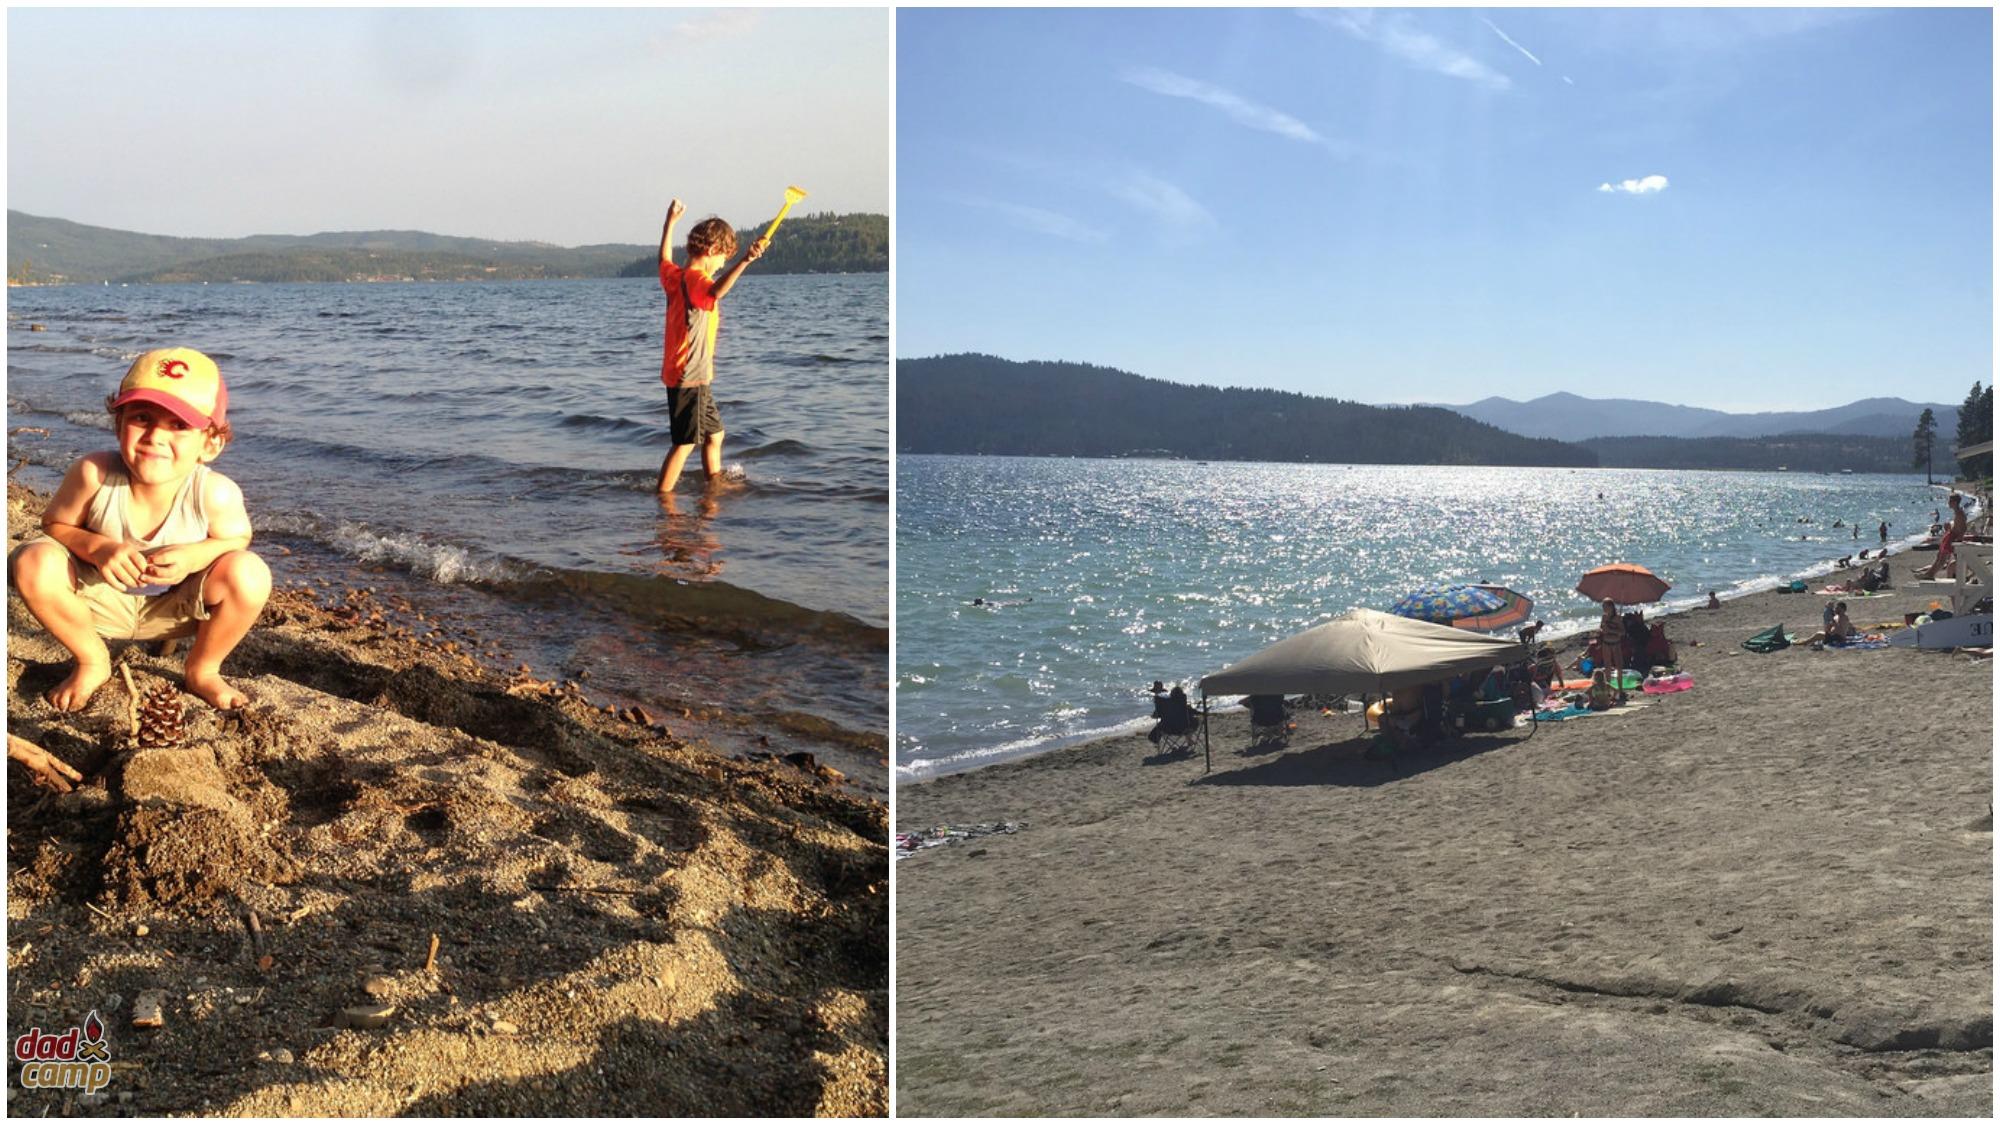 Beaches on Lake Coeur D'Alene - DadCAMP